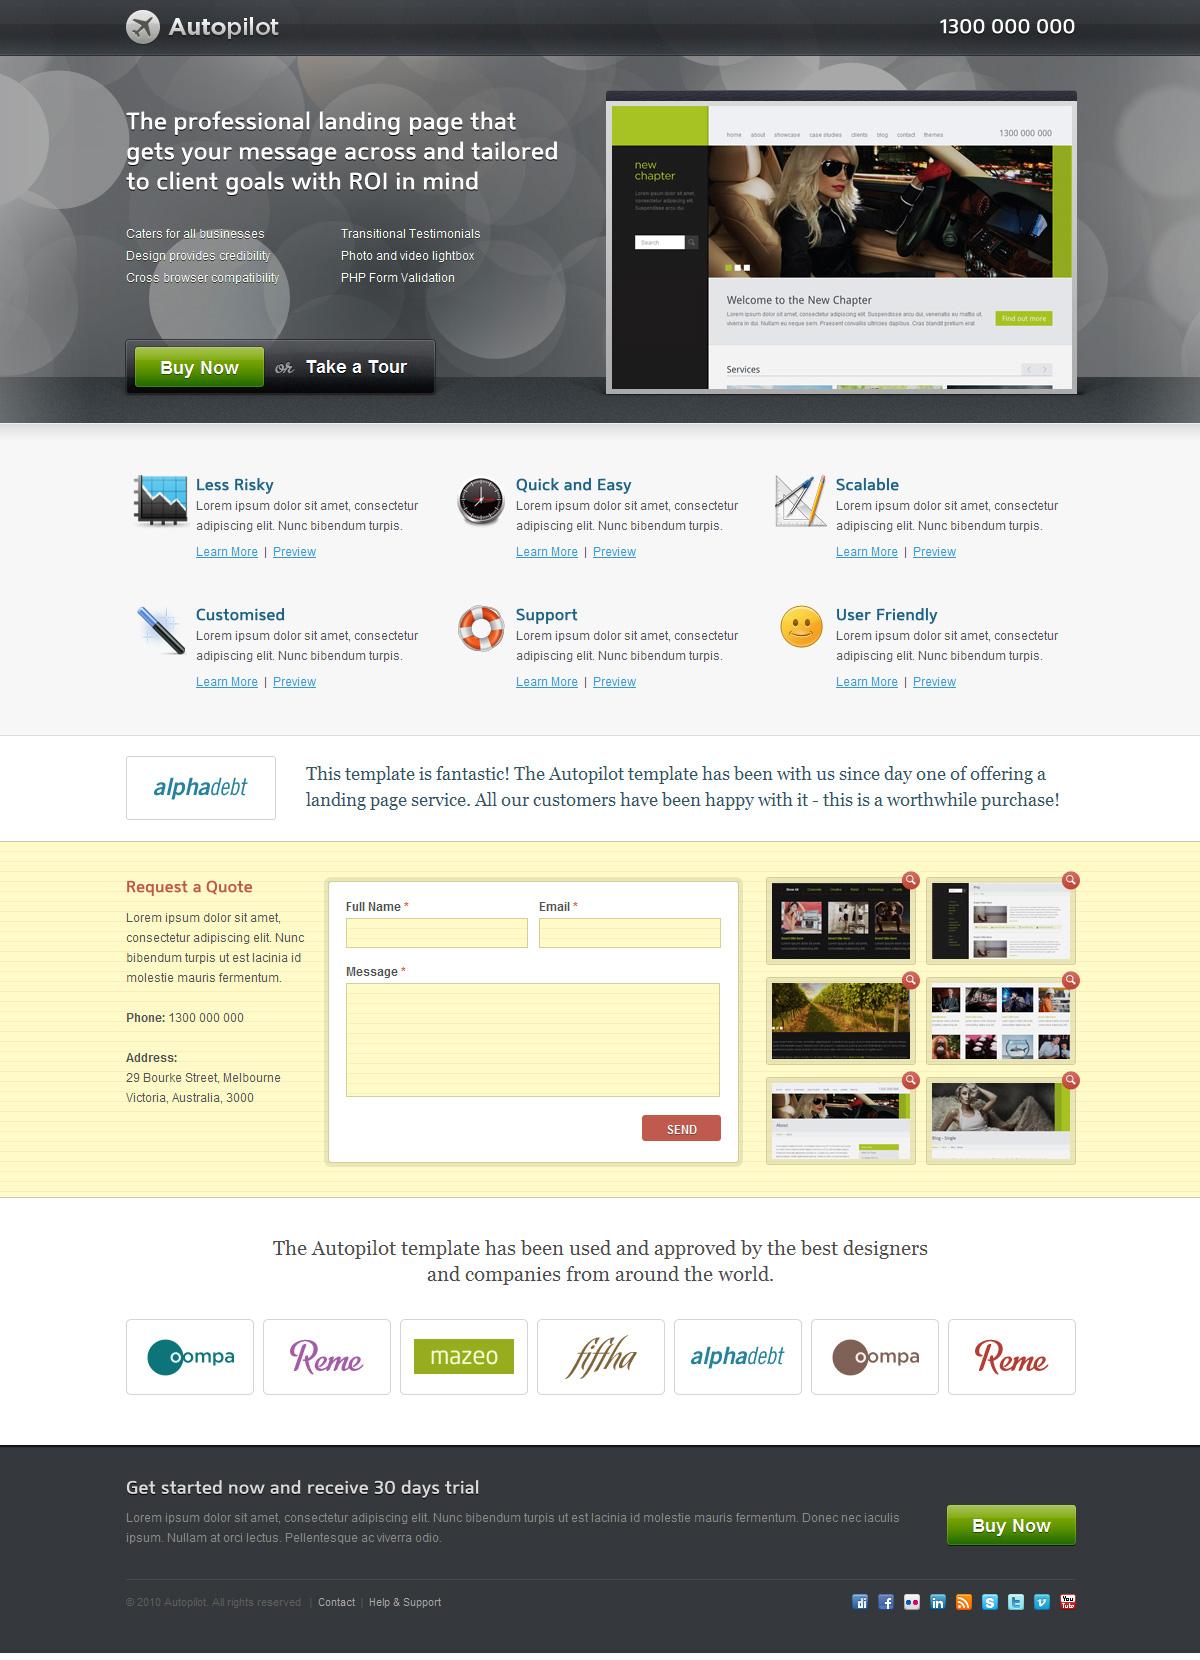 Autopilot Landing Page (3 Themes) - Screenshot 04 - Generic